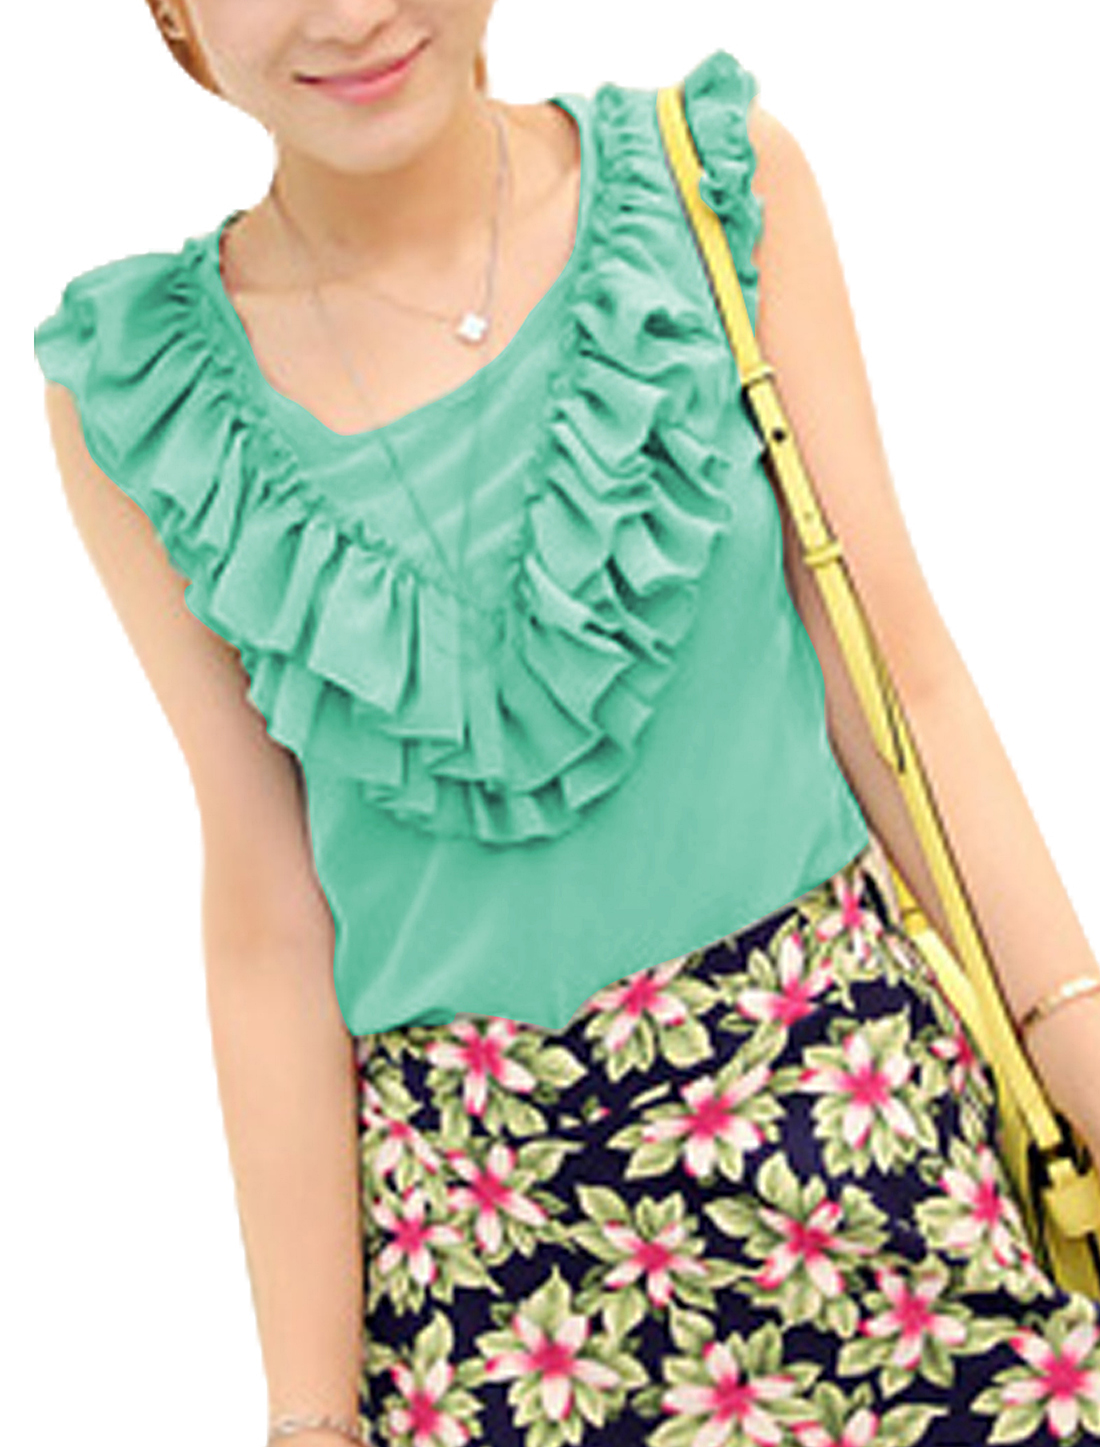 Ladies Chiffon Sleeveless Round Neck Sexy Shirts Light Green S